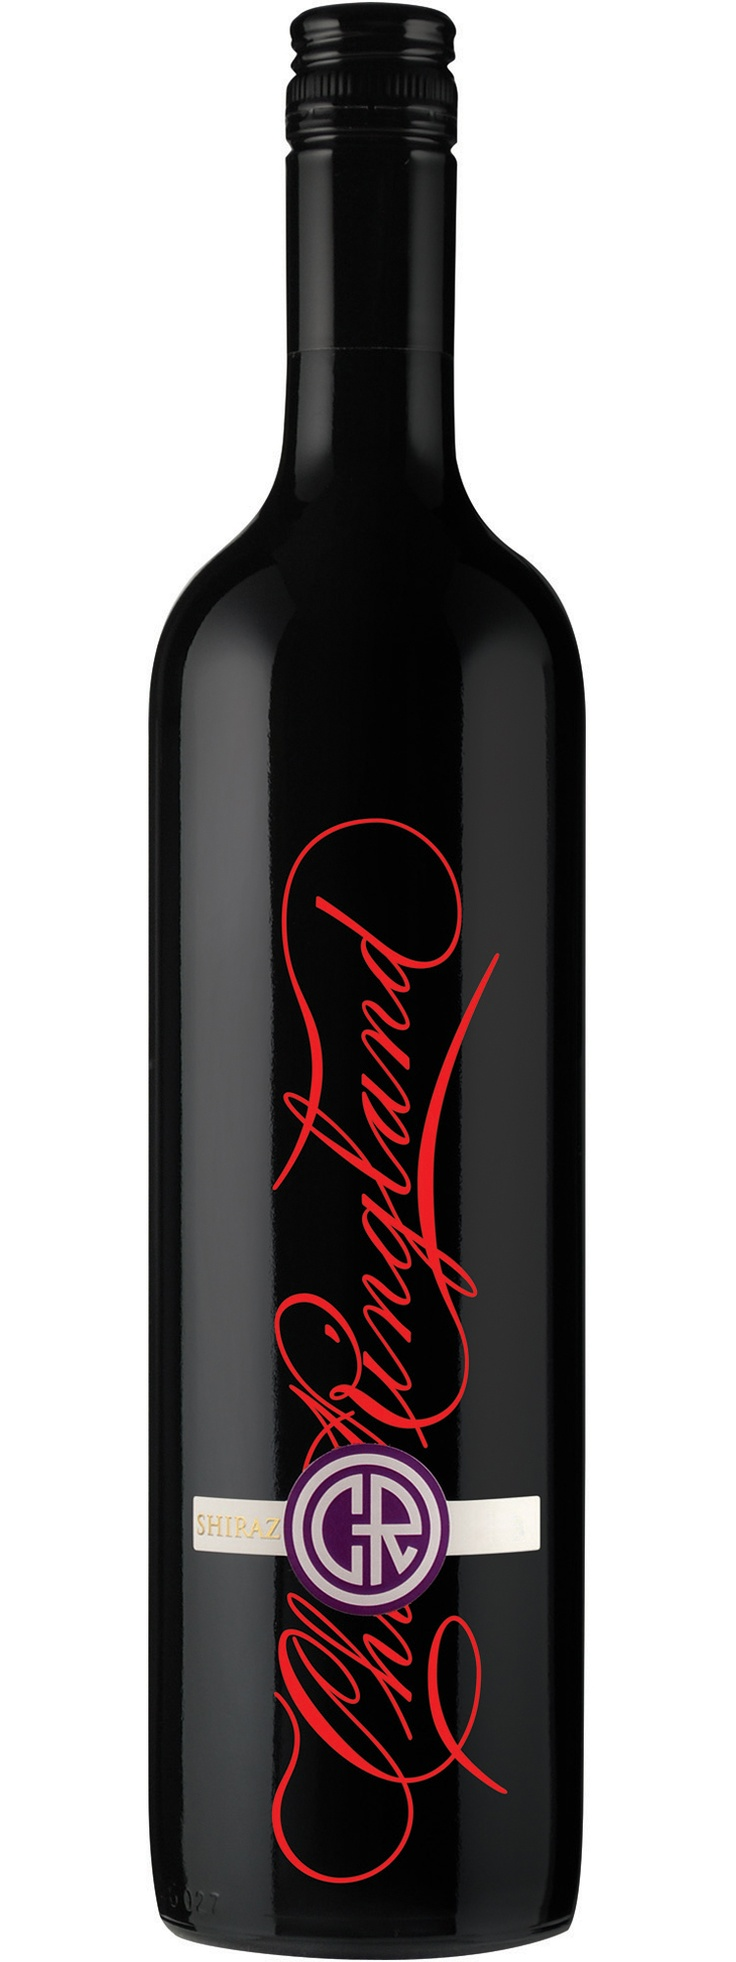 Chris Ringland CR Shiraz - big powerful wine